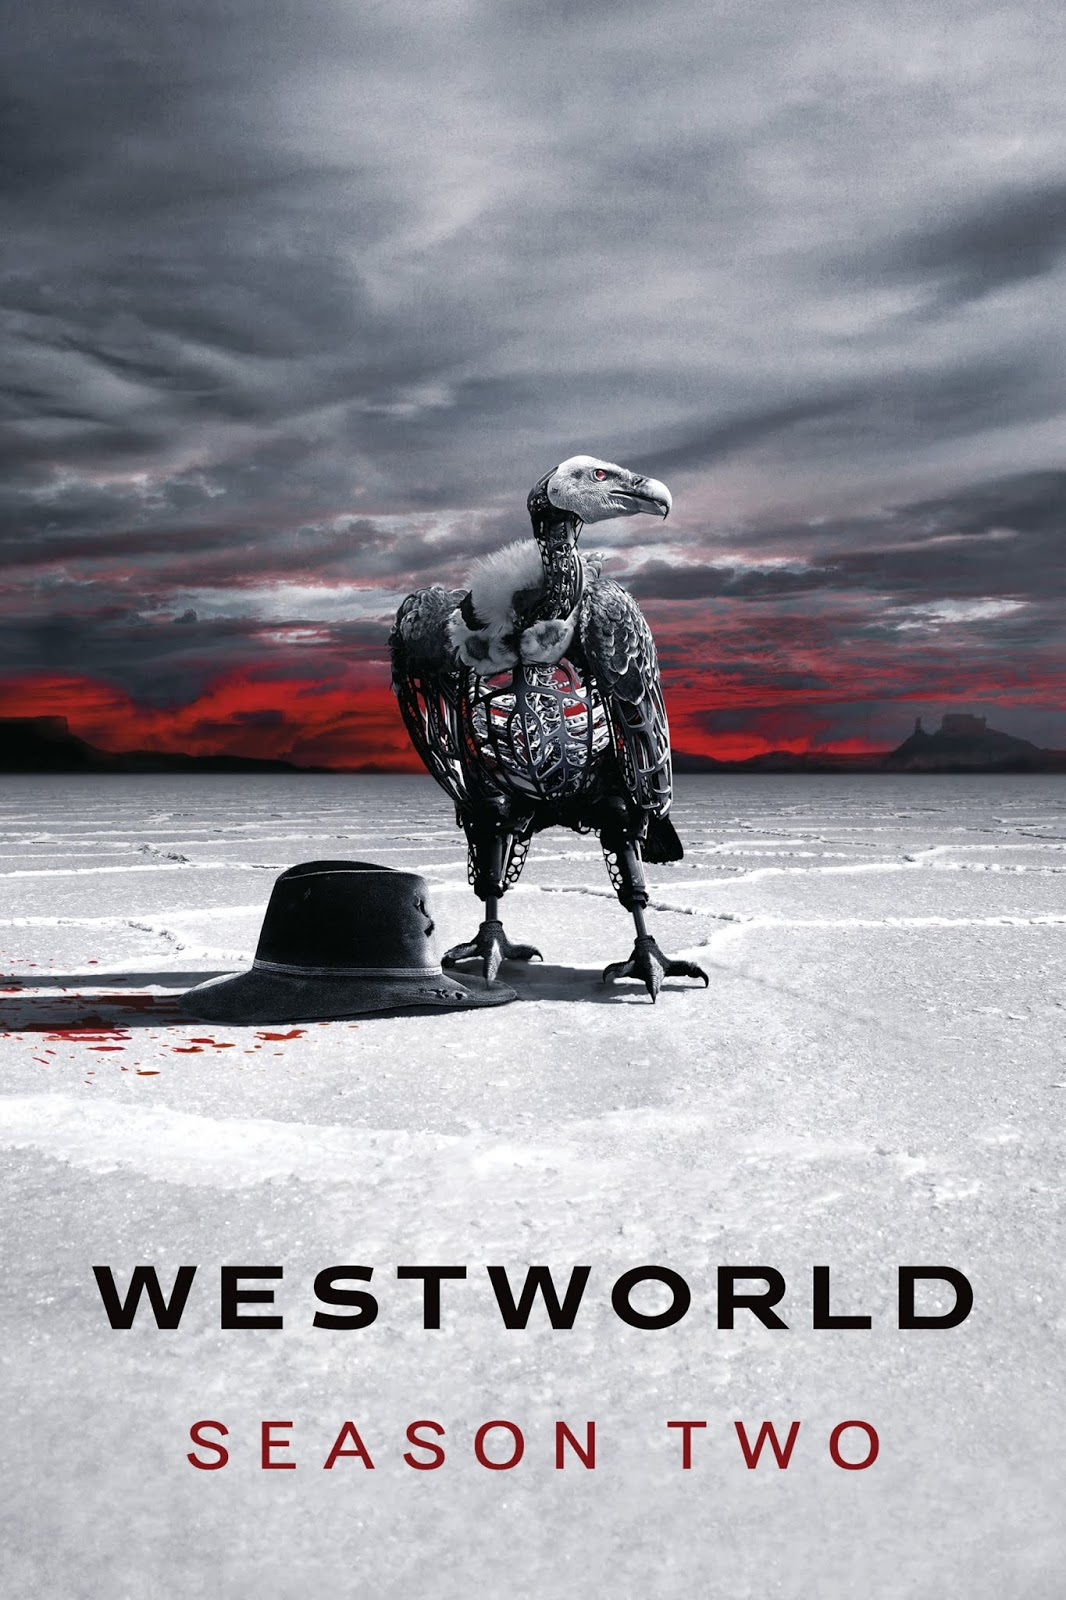 WATCH WESTWORLD SEASON 2 PUTLOCKERS MOVIES FULL EPISODE - putlockers-movie.ws